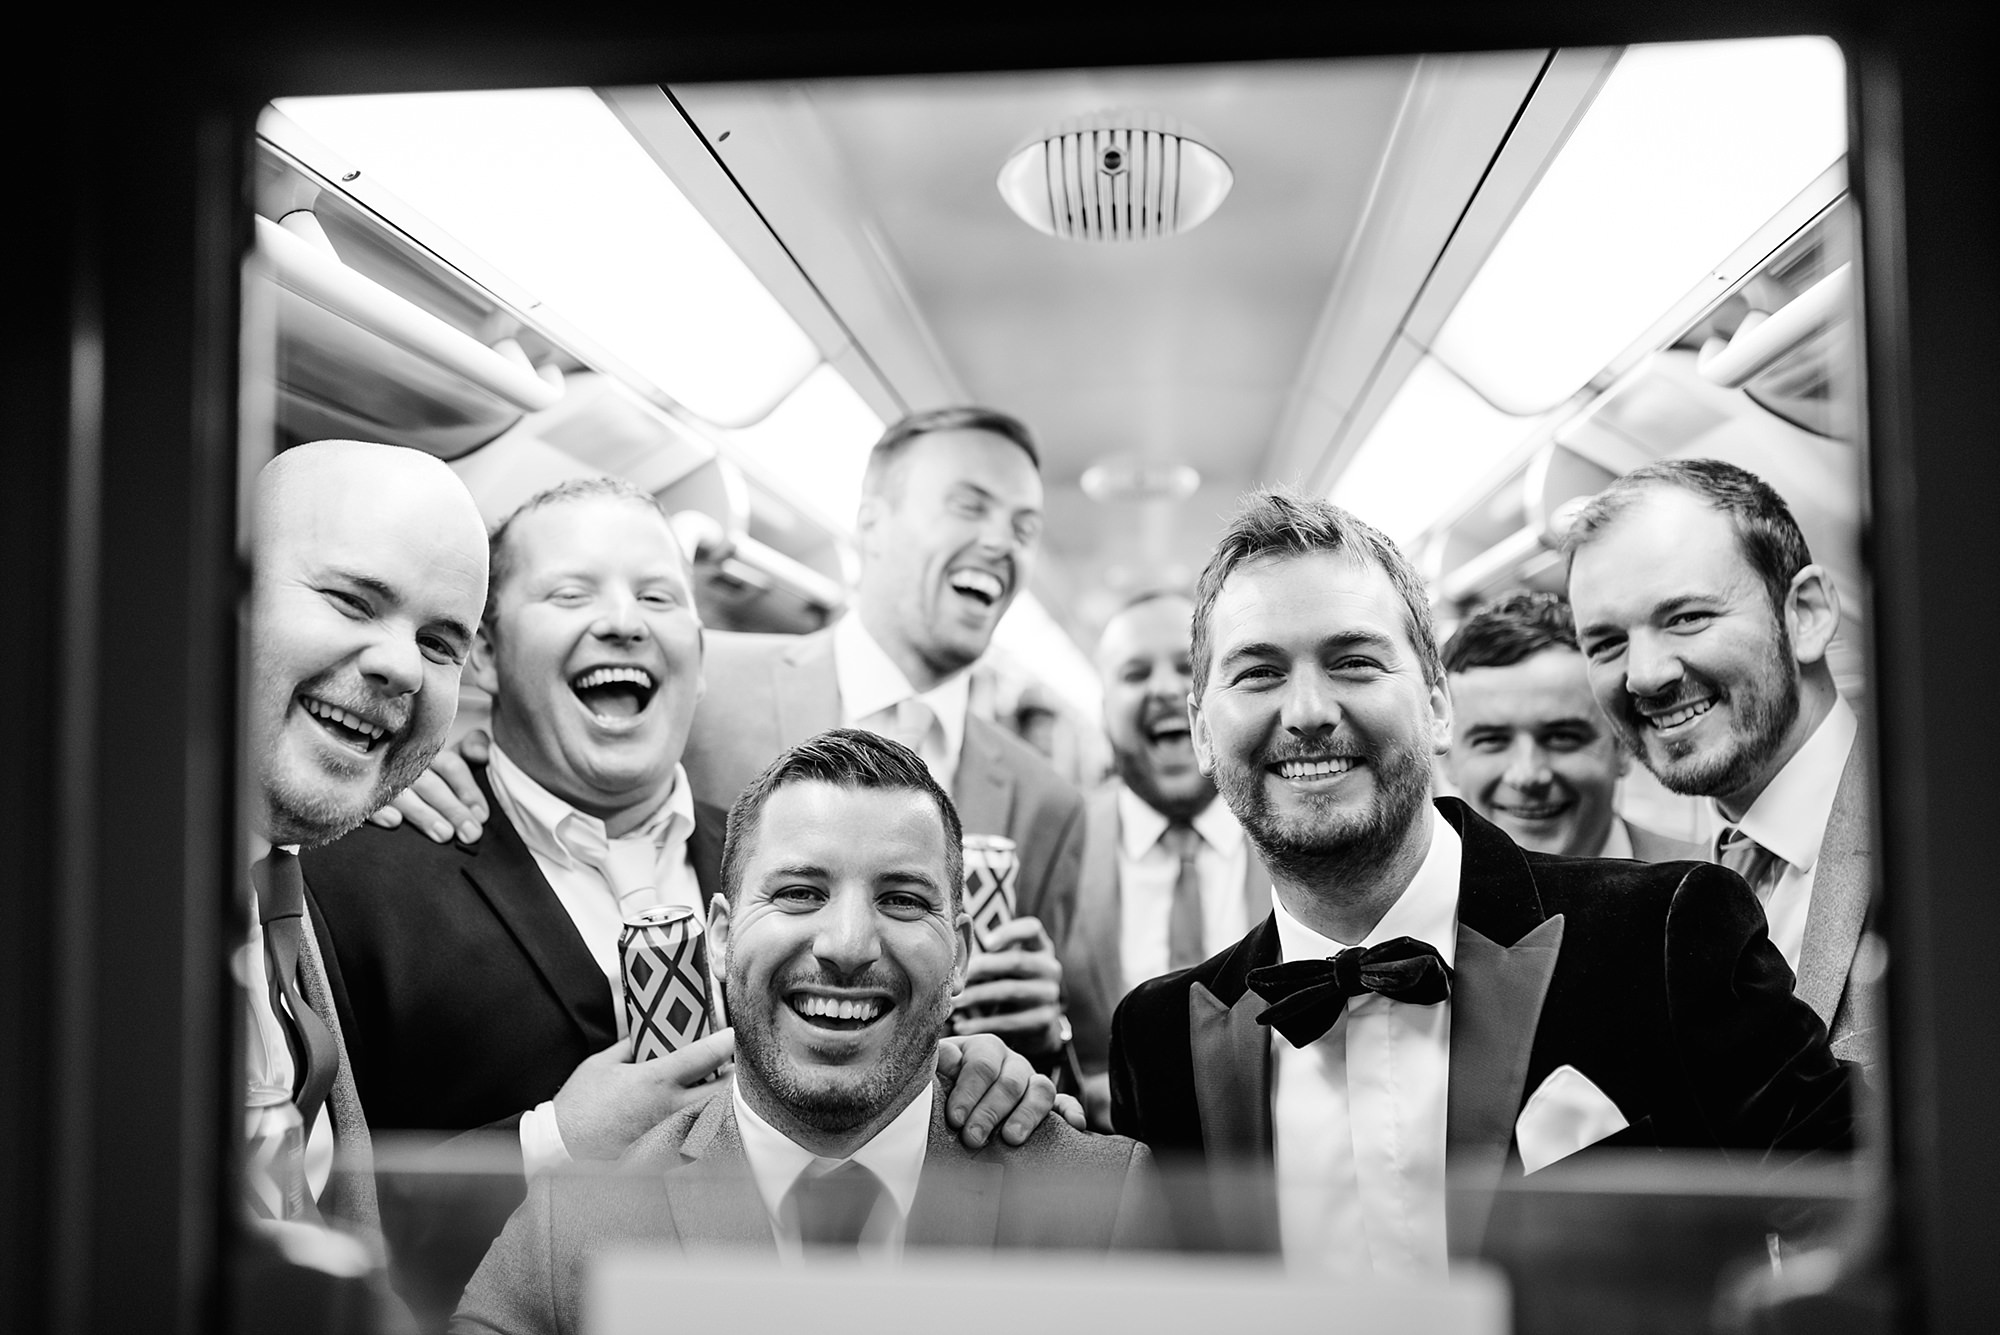 Fun London Wedding funny portrait of from and groomsmen through tube window